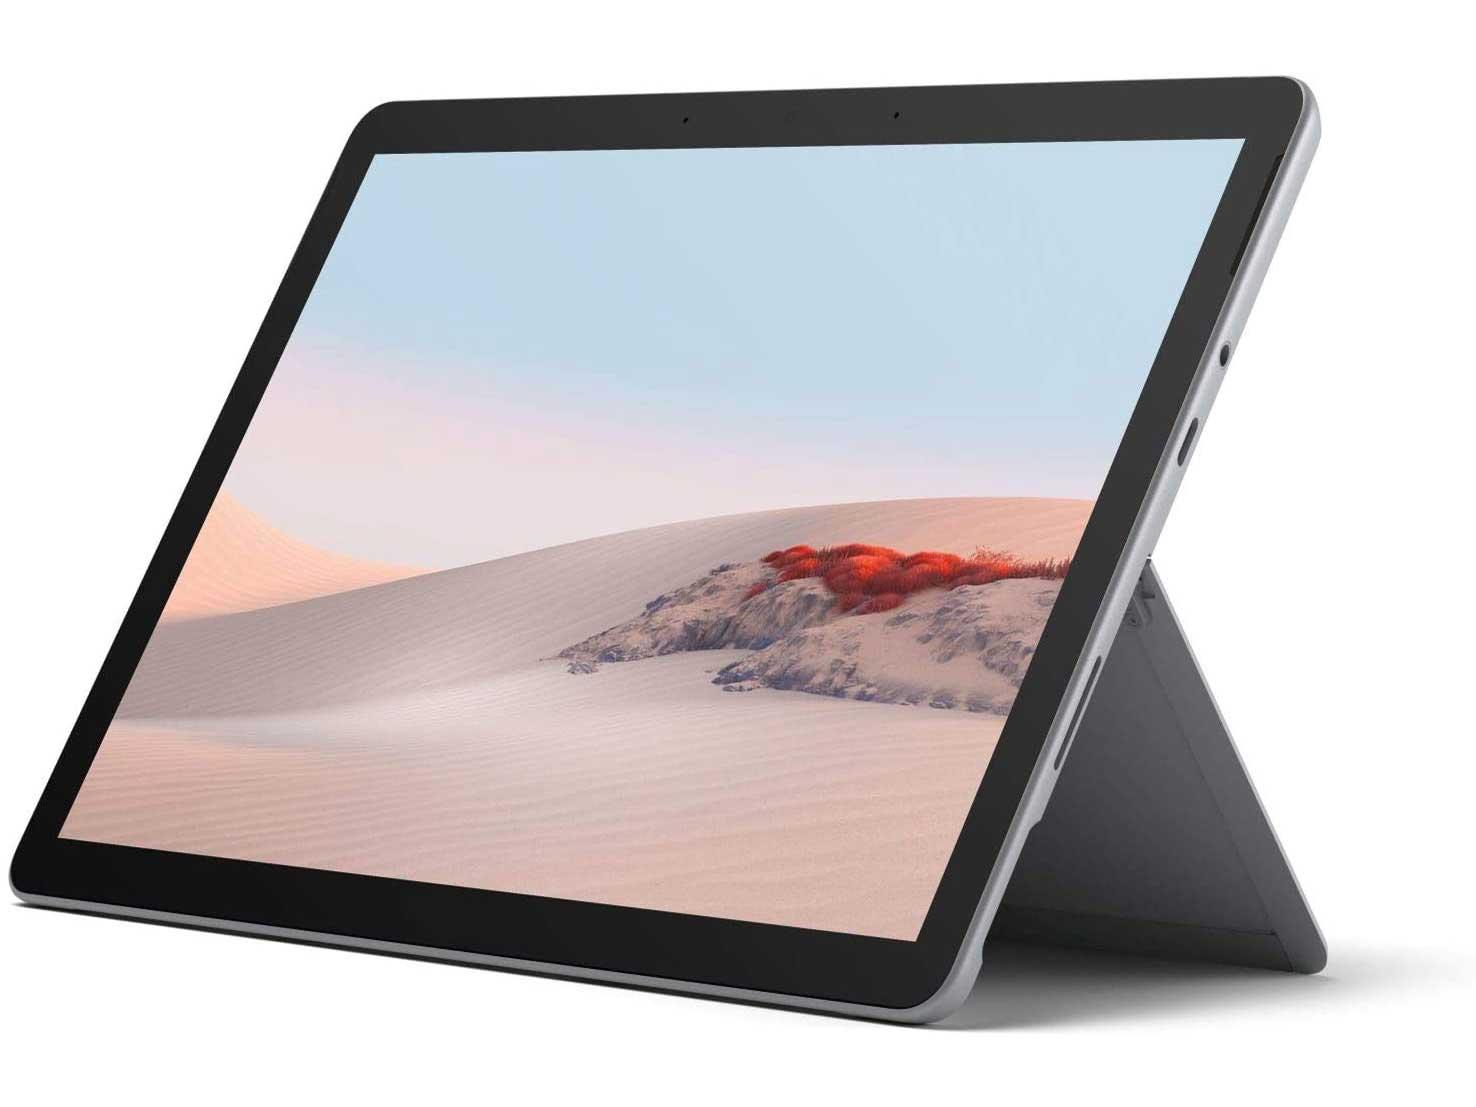 Microsoft Surface GO 2 10 Inch Tablet PC - (Silver) (Intel Pentium Gold Processor 4425Y, 4 GB RAM, 64 GB eMMC, Windows 10 Home in S Mode, 2020 Model)